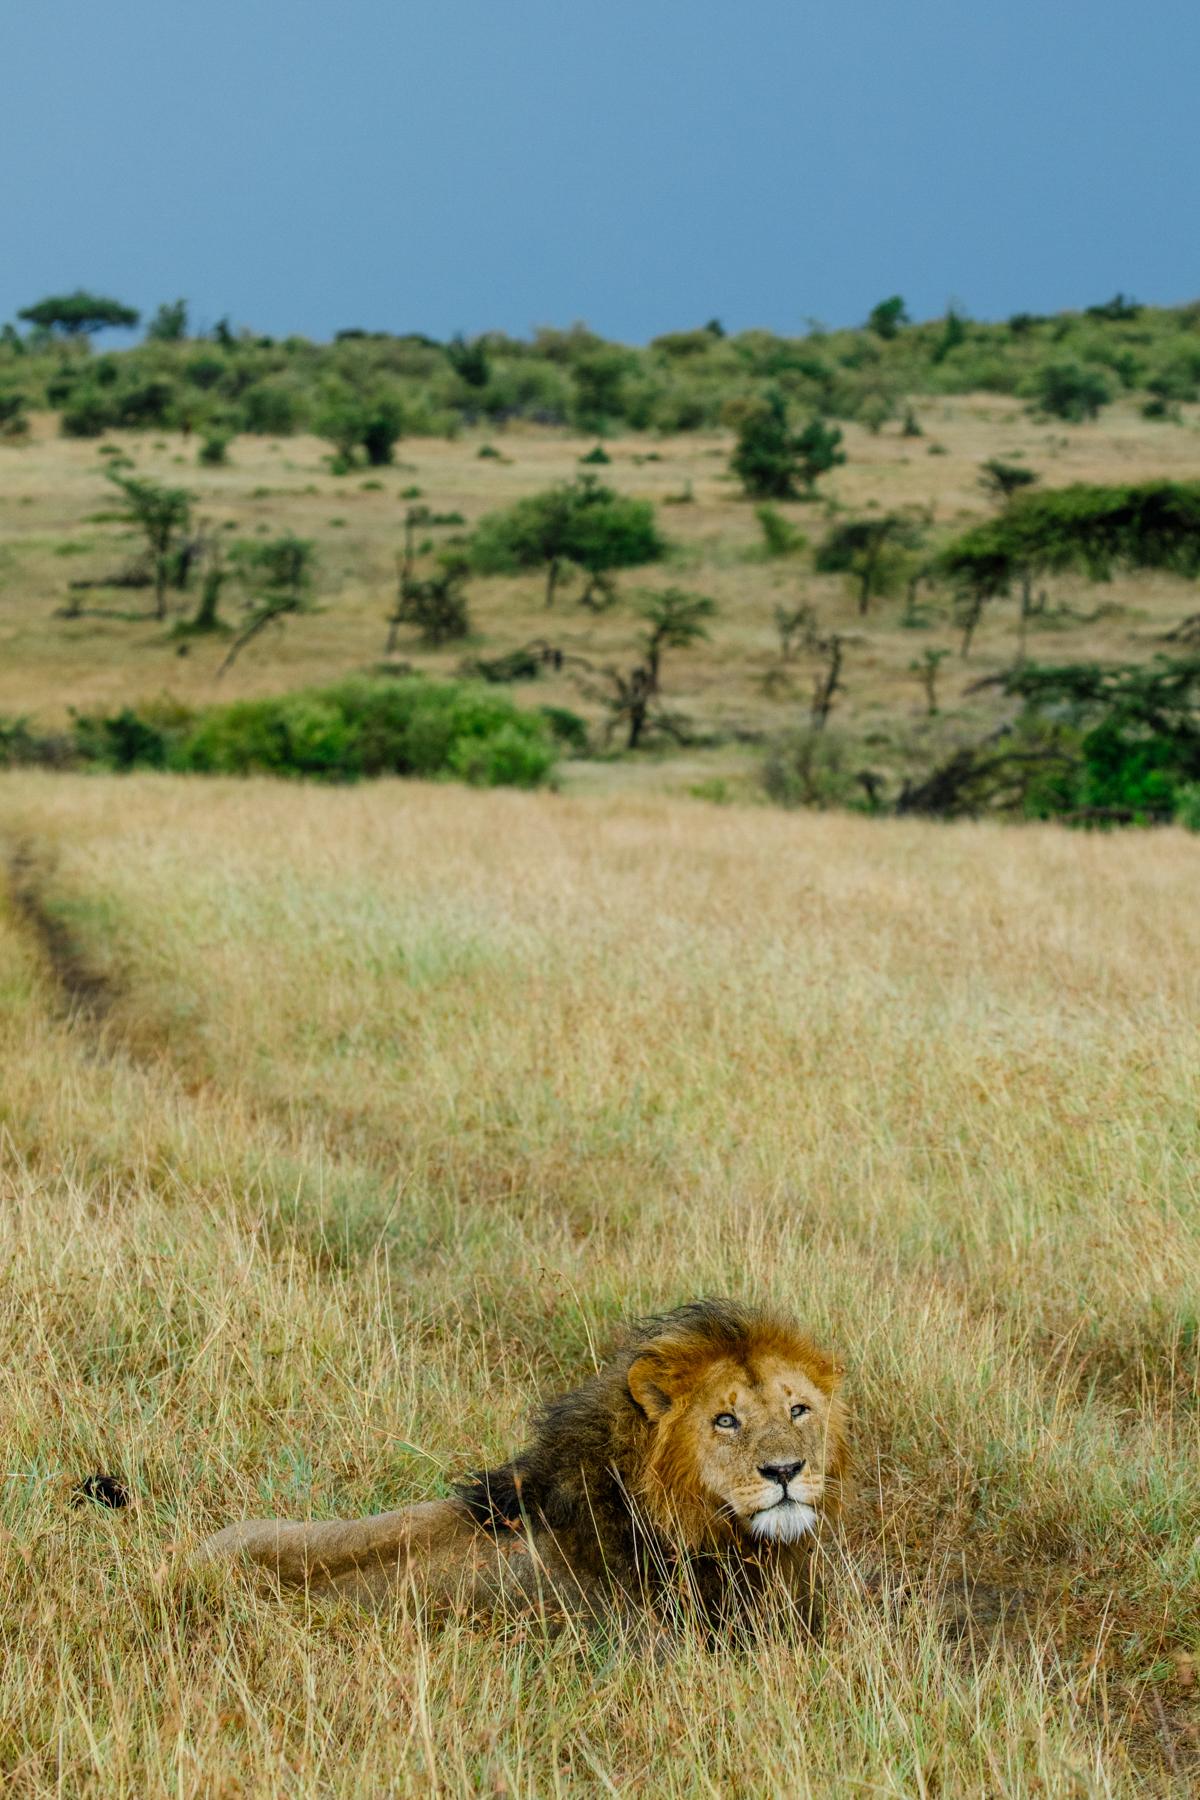 KenyaFeb2019_Safari-241.jpg